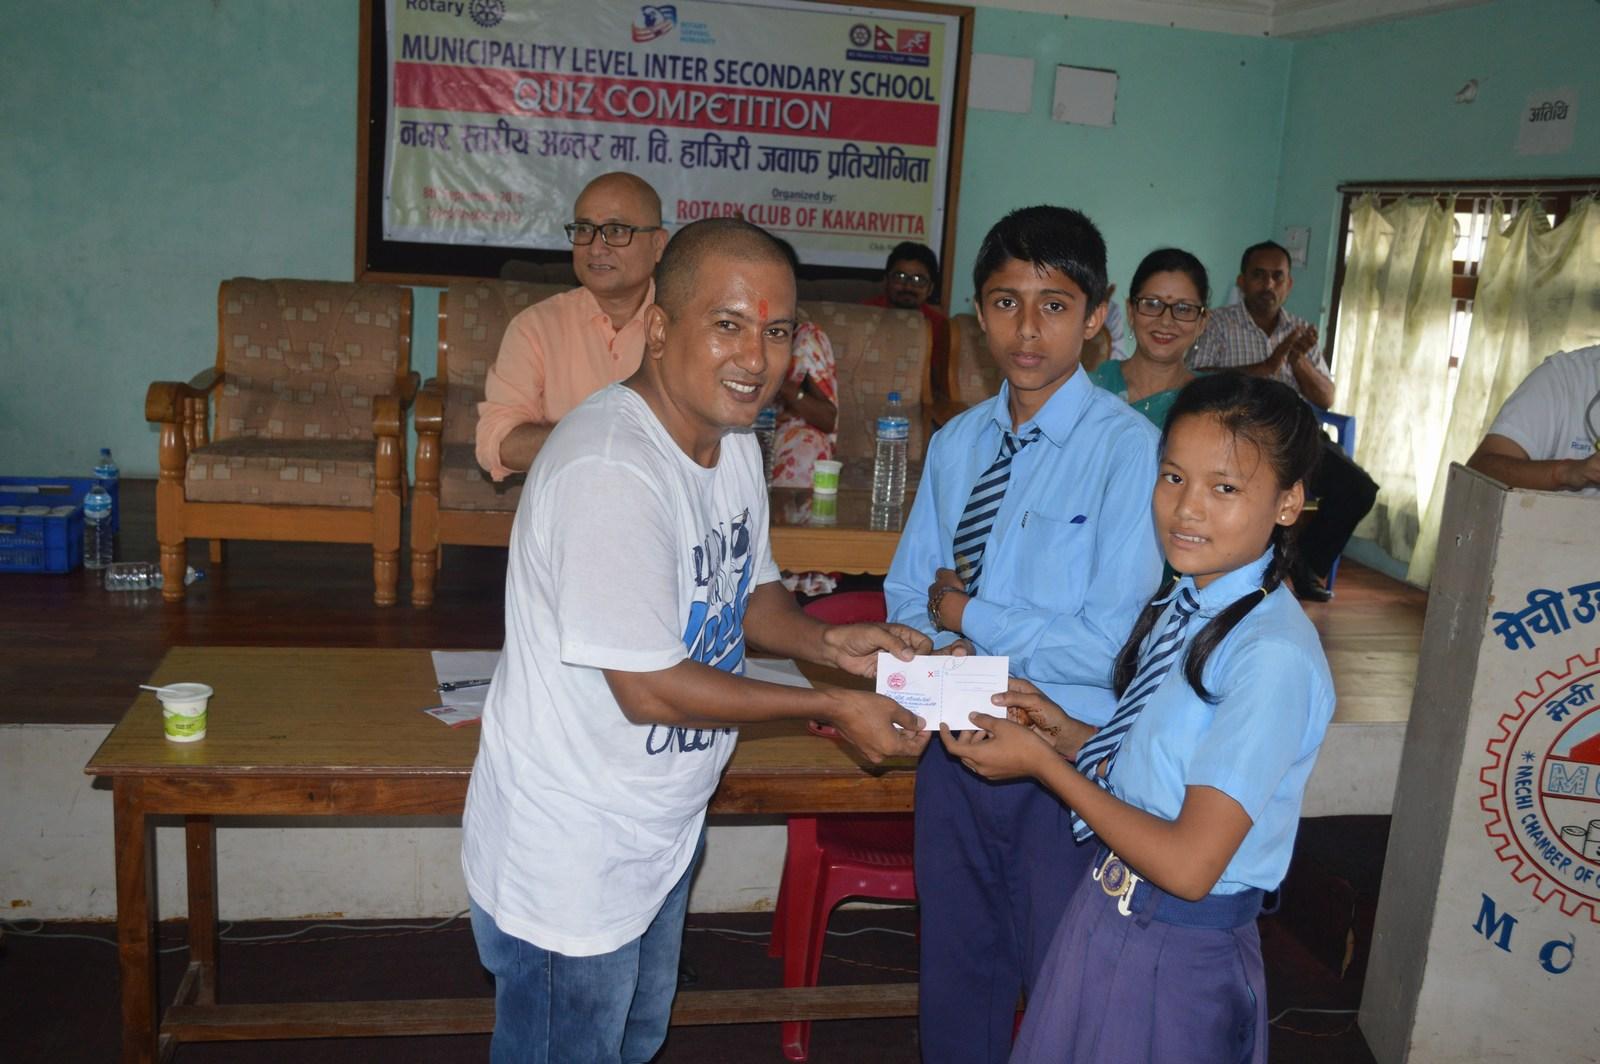 Municipality-Level-Inter-Secondary-School-Quiz-Contest-2016-Rotary-Club-of-Kakarvitta-61